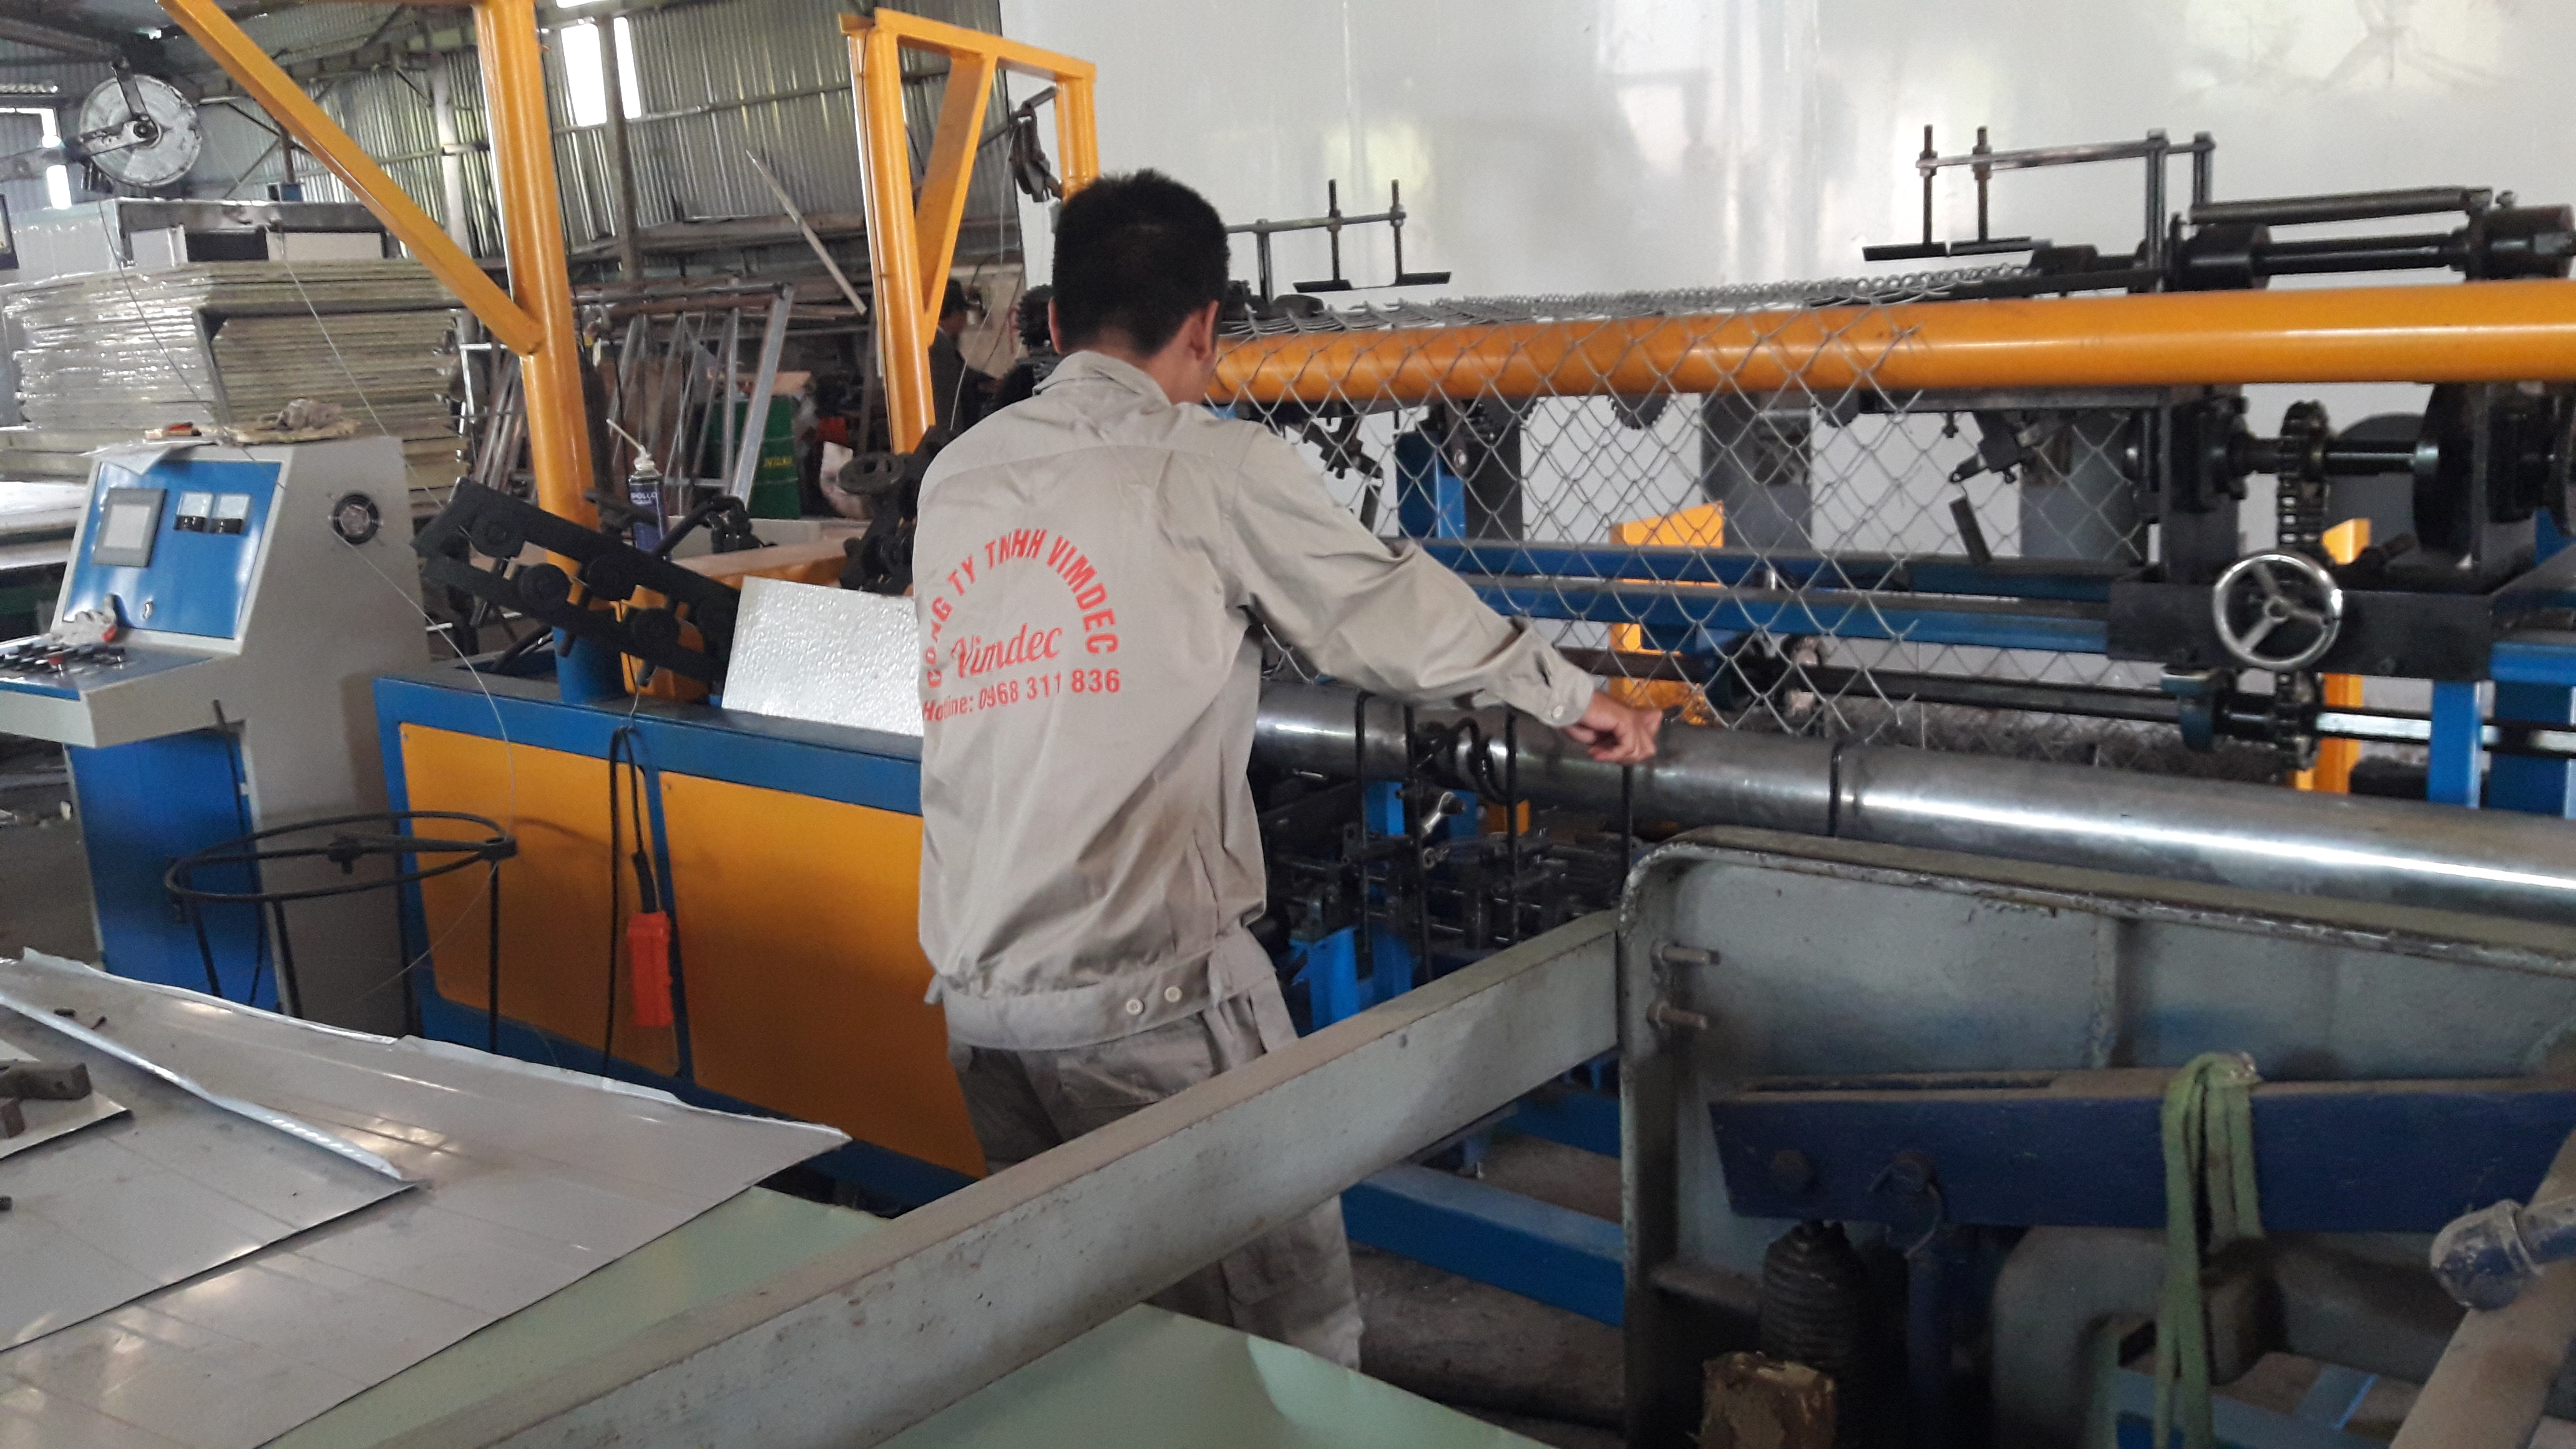 Repair, upgrade chain link fence machine b40